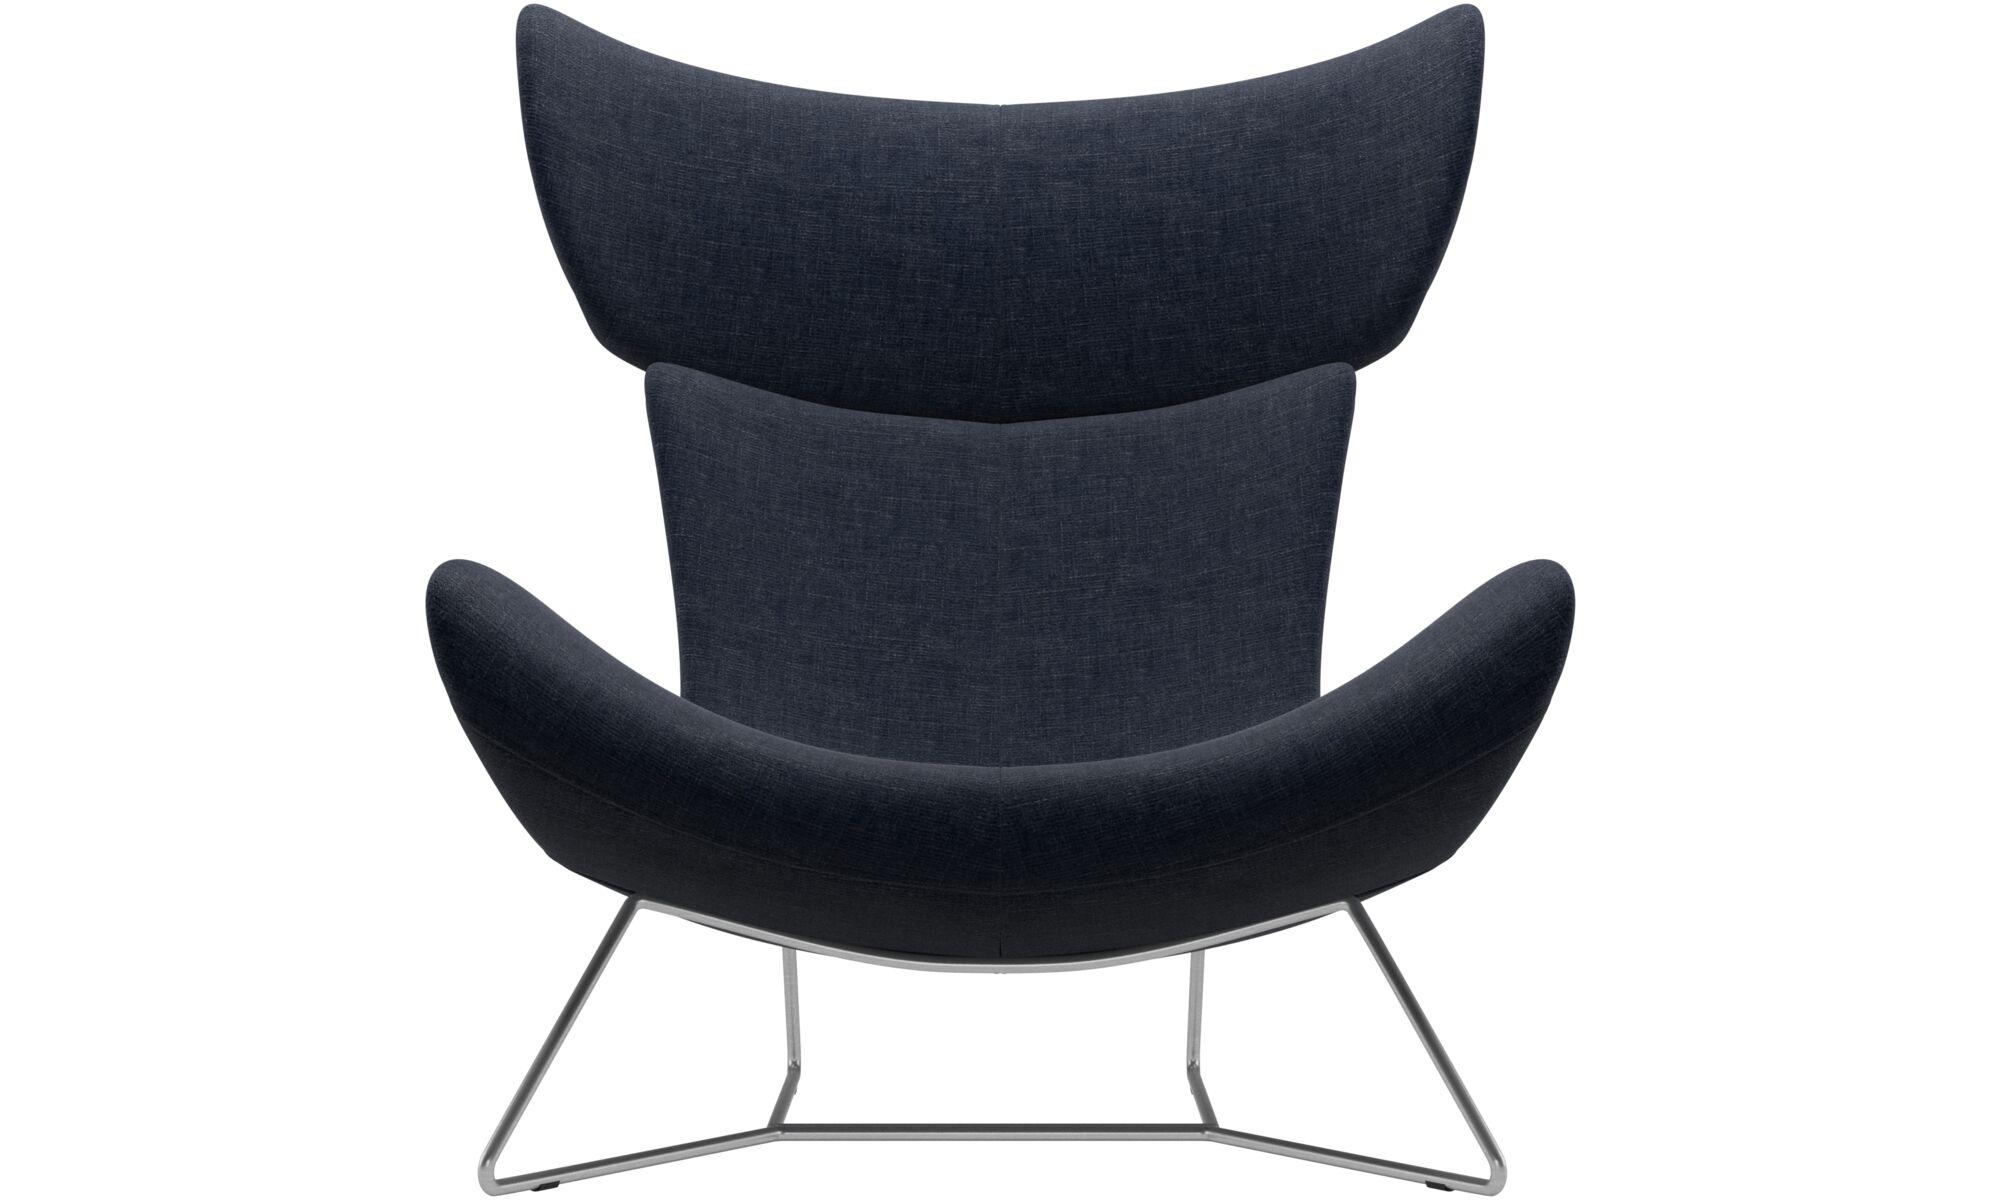 dunkelblauer napoli stoff imola sessel boconcept. Black Bedroom Furniture Sets. Home Design Ideas